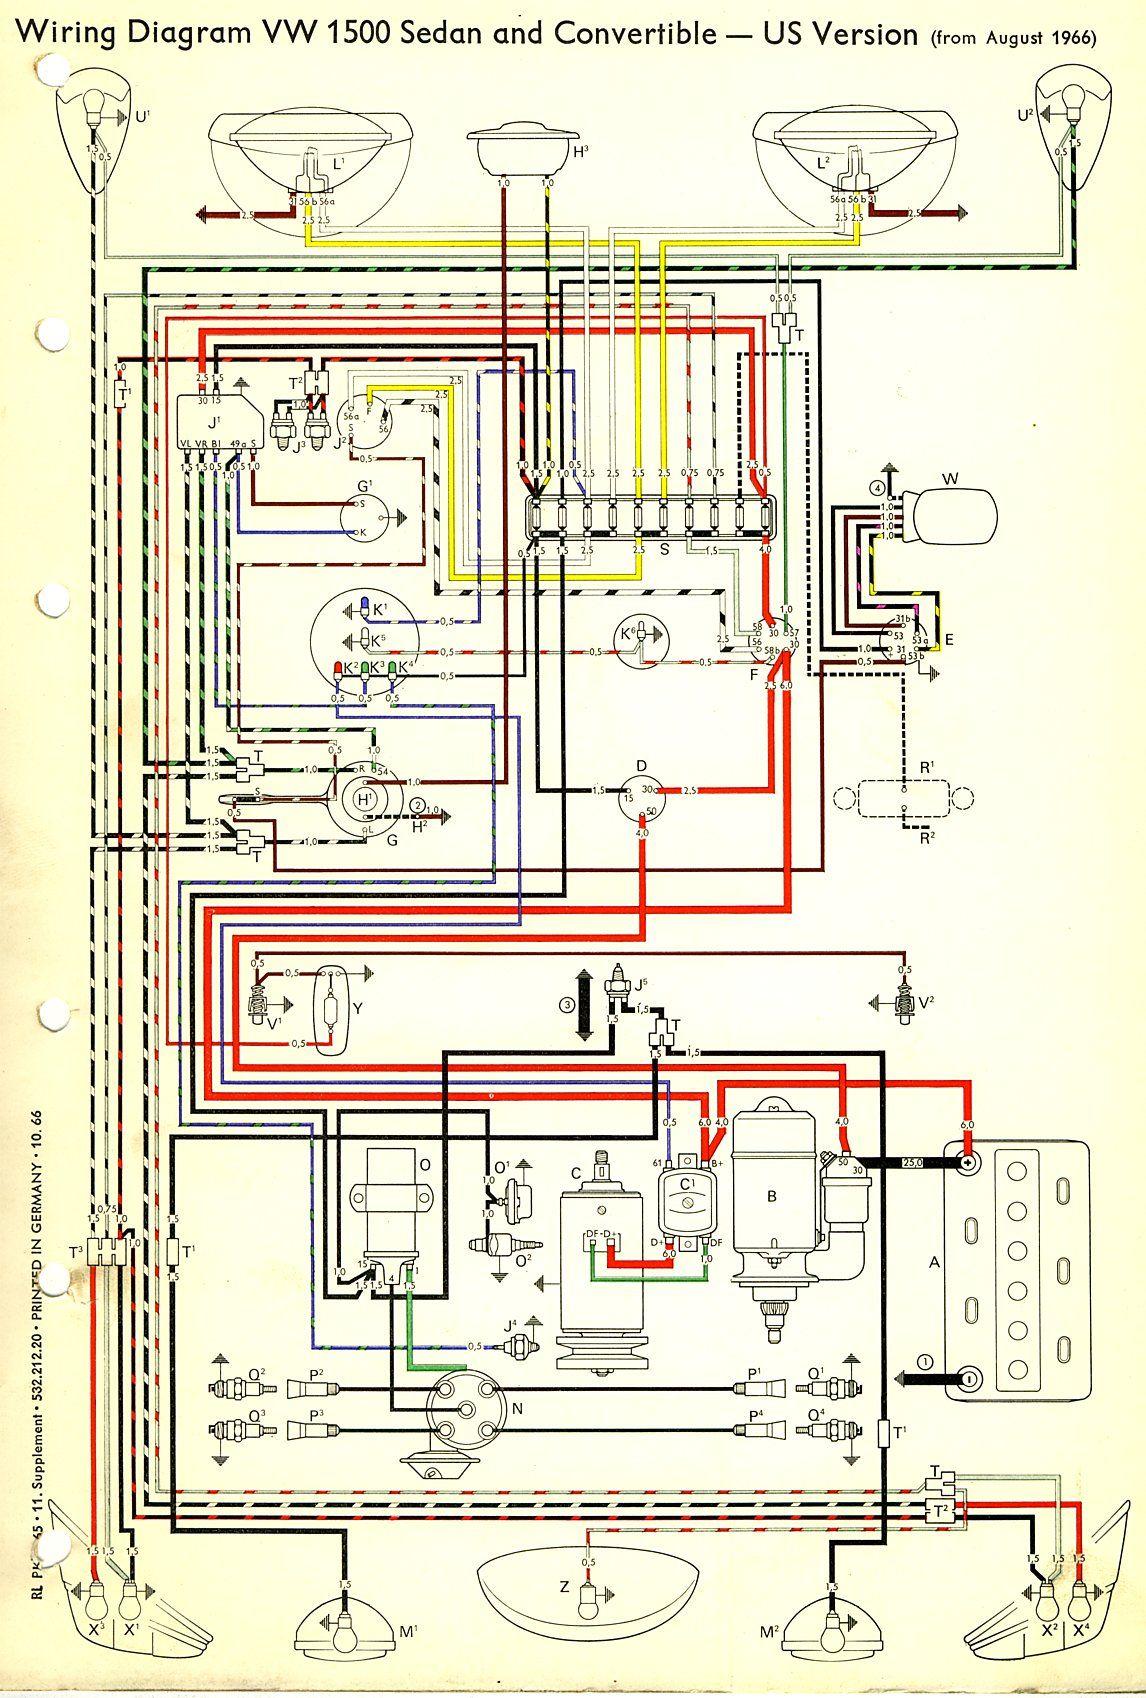 1967 Beetle Wiring Diagram USA TheGoldenBug Com Best 1967 VW